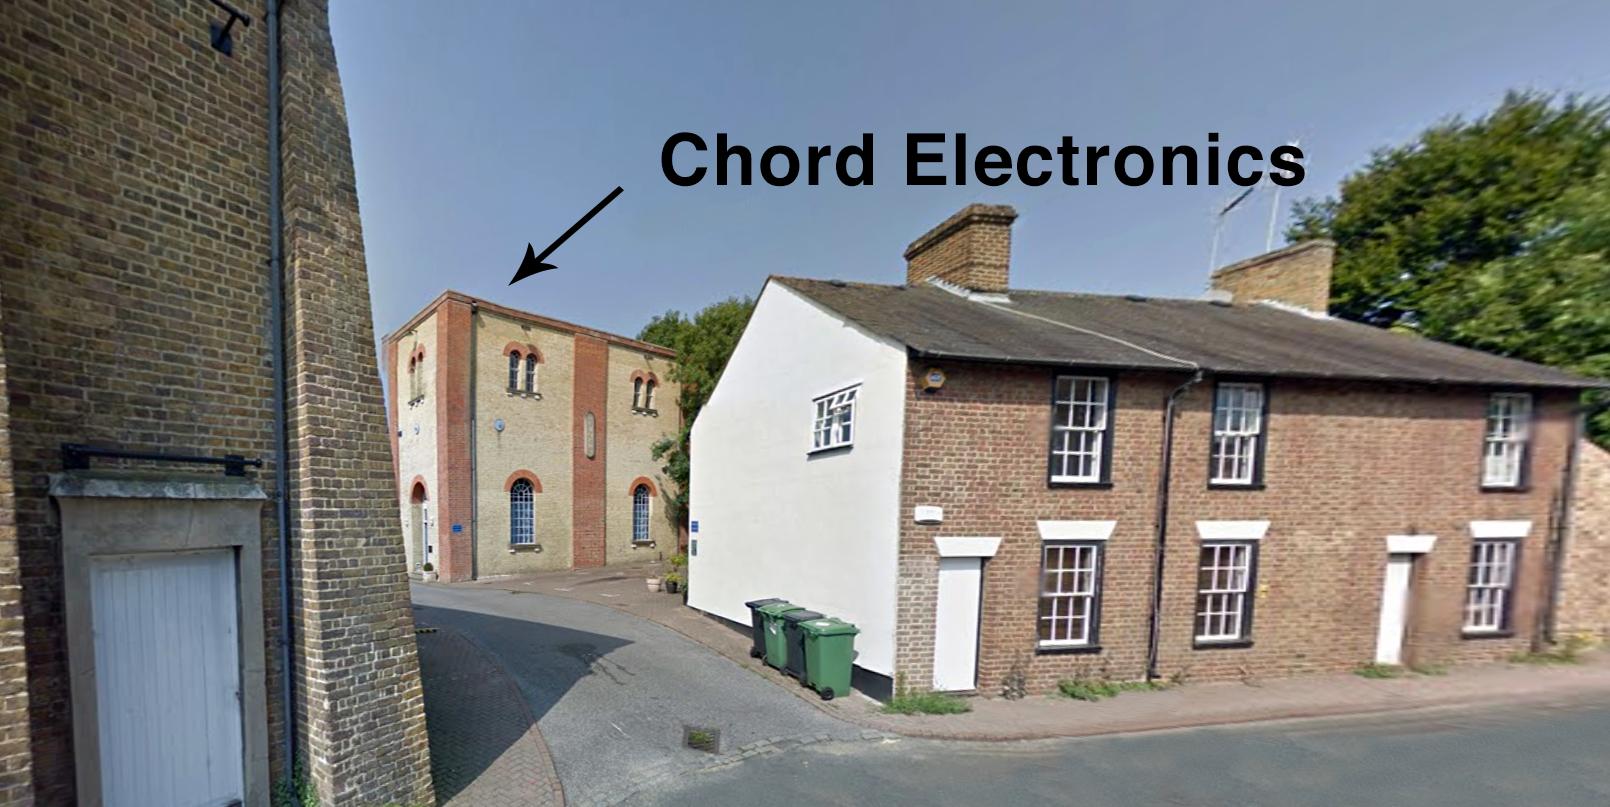 image Chord Electronics Pumphous